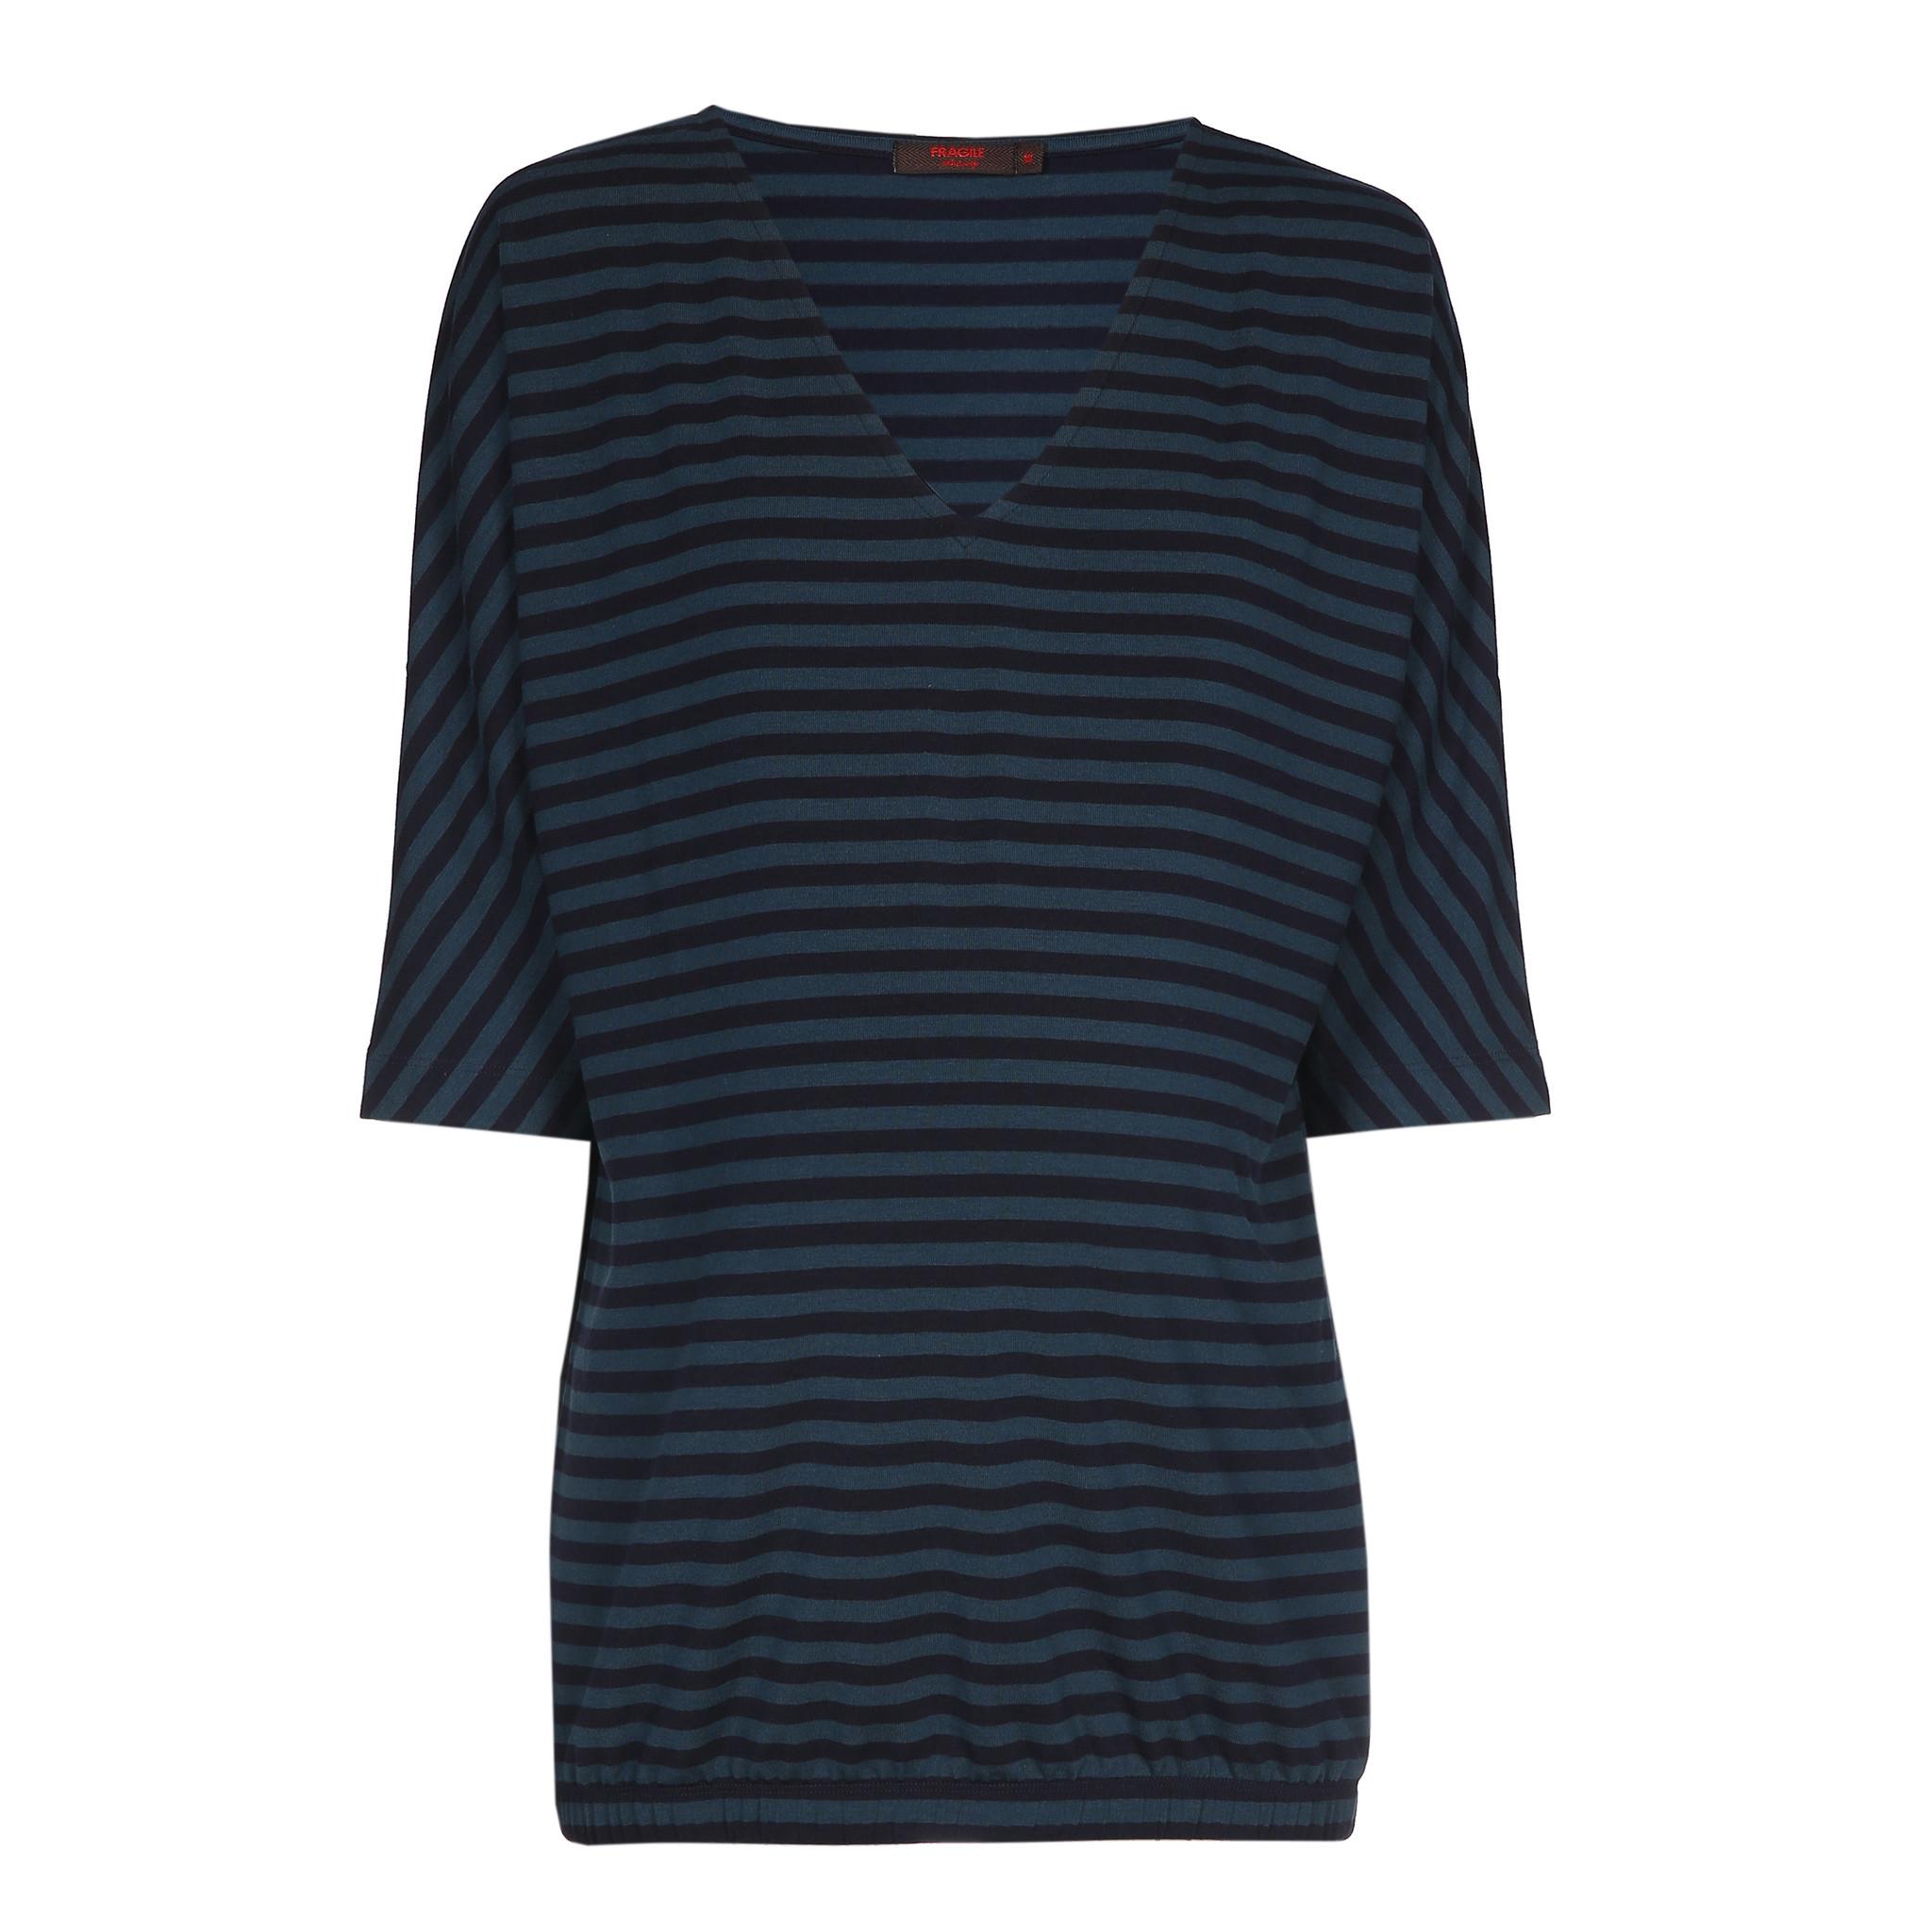 V-neck kimono sweater - petrol/navy stripes-2